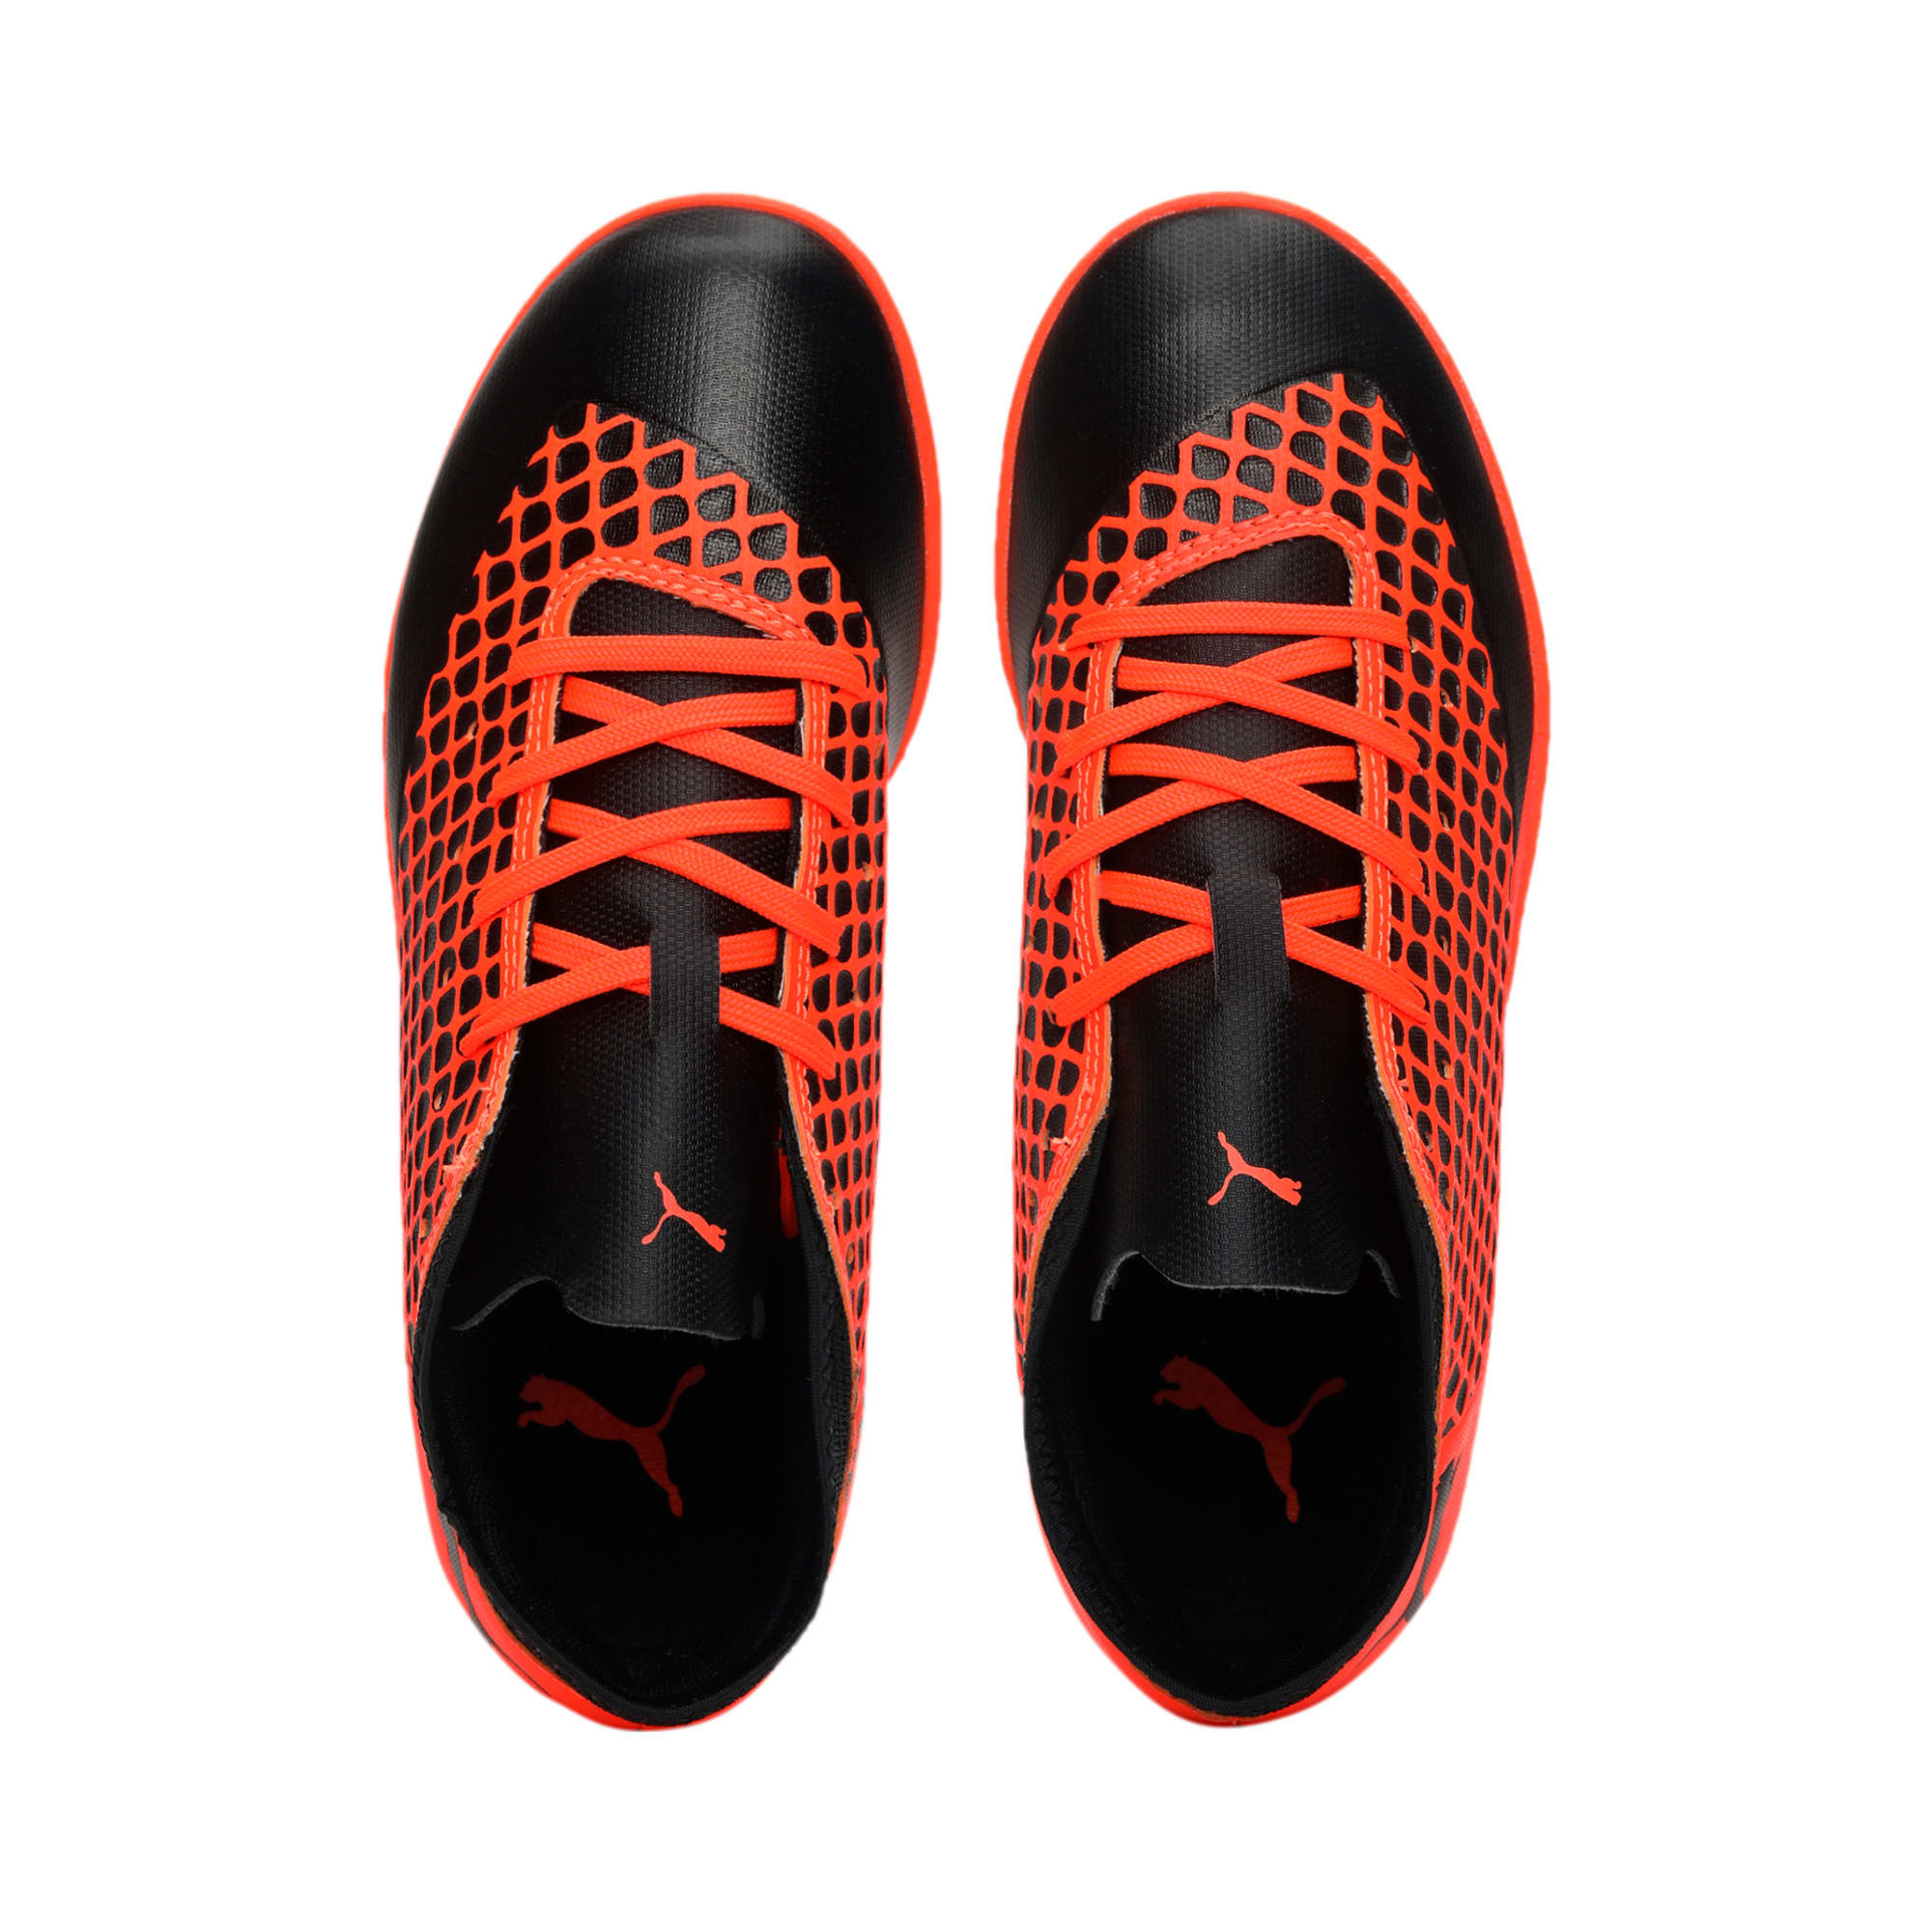 Thumbnail 6 of FUTURE 2.4 TT Kids' Football Boots, Black-Orange, medium-IND